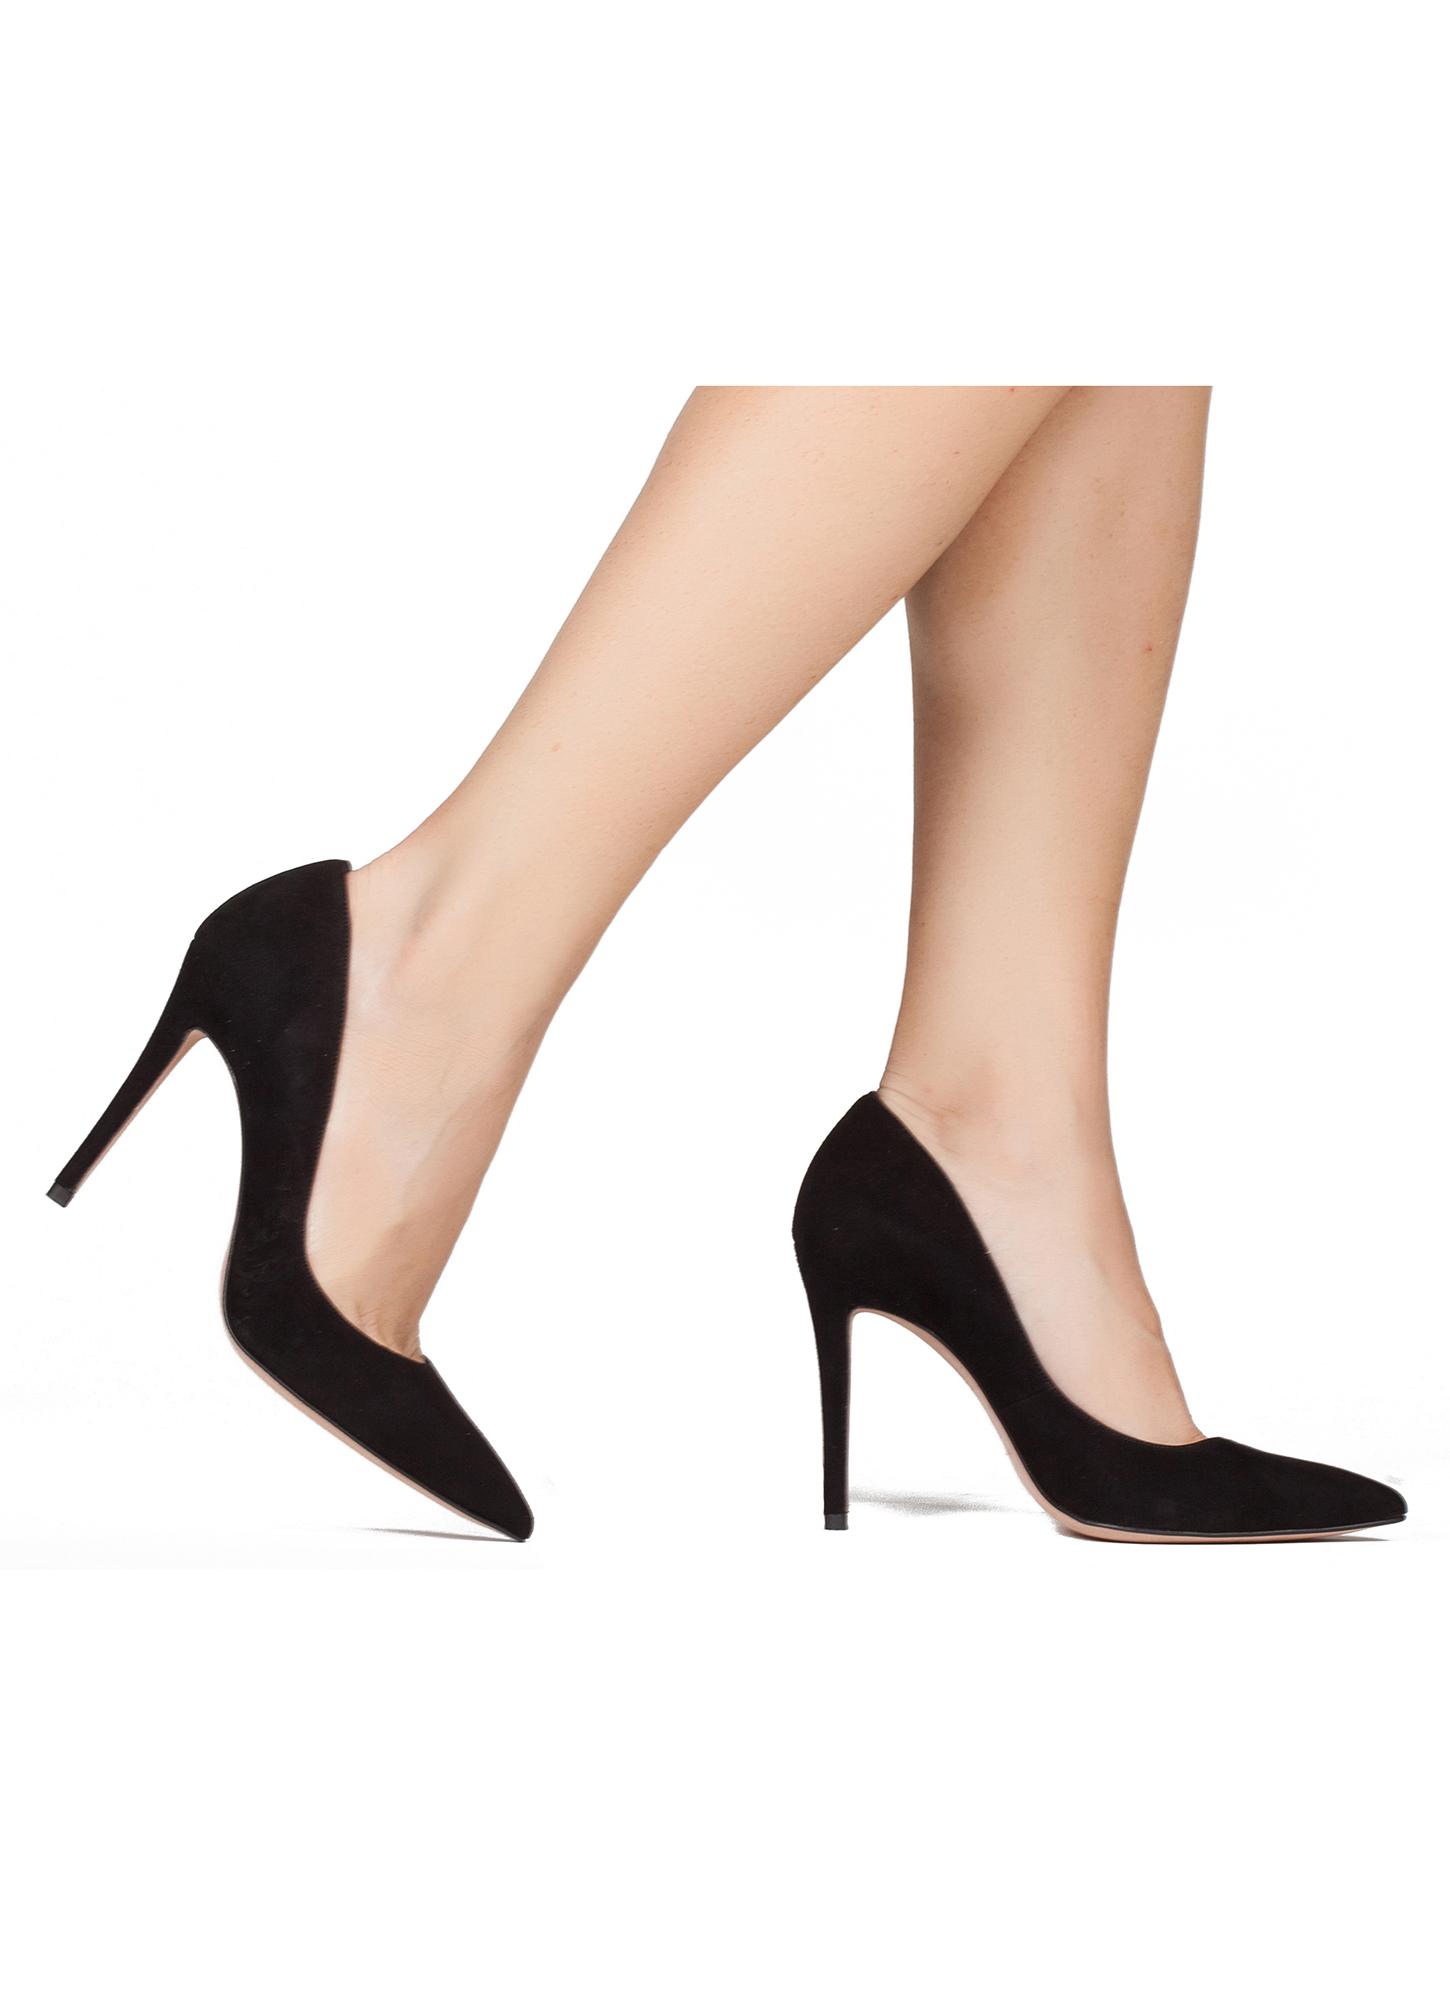 Hardcore high heels porn-1074